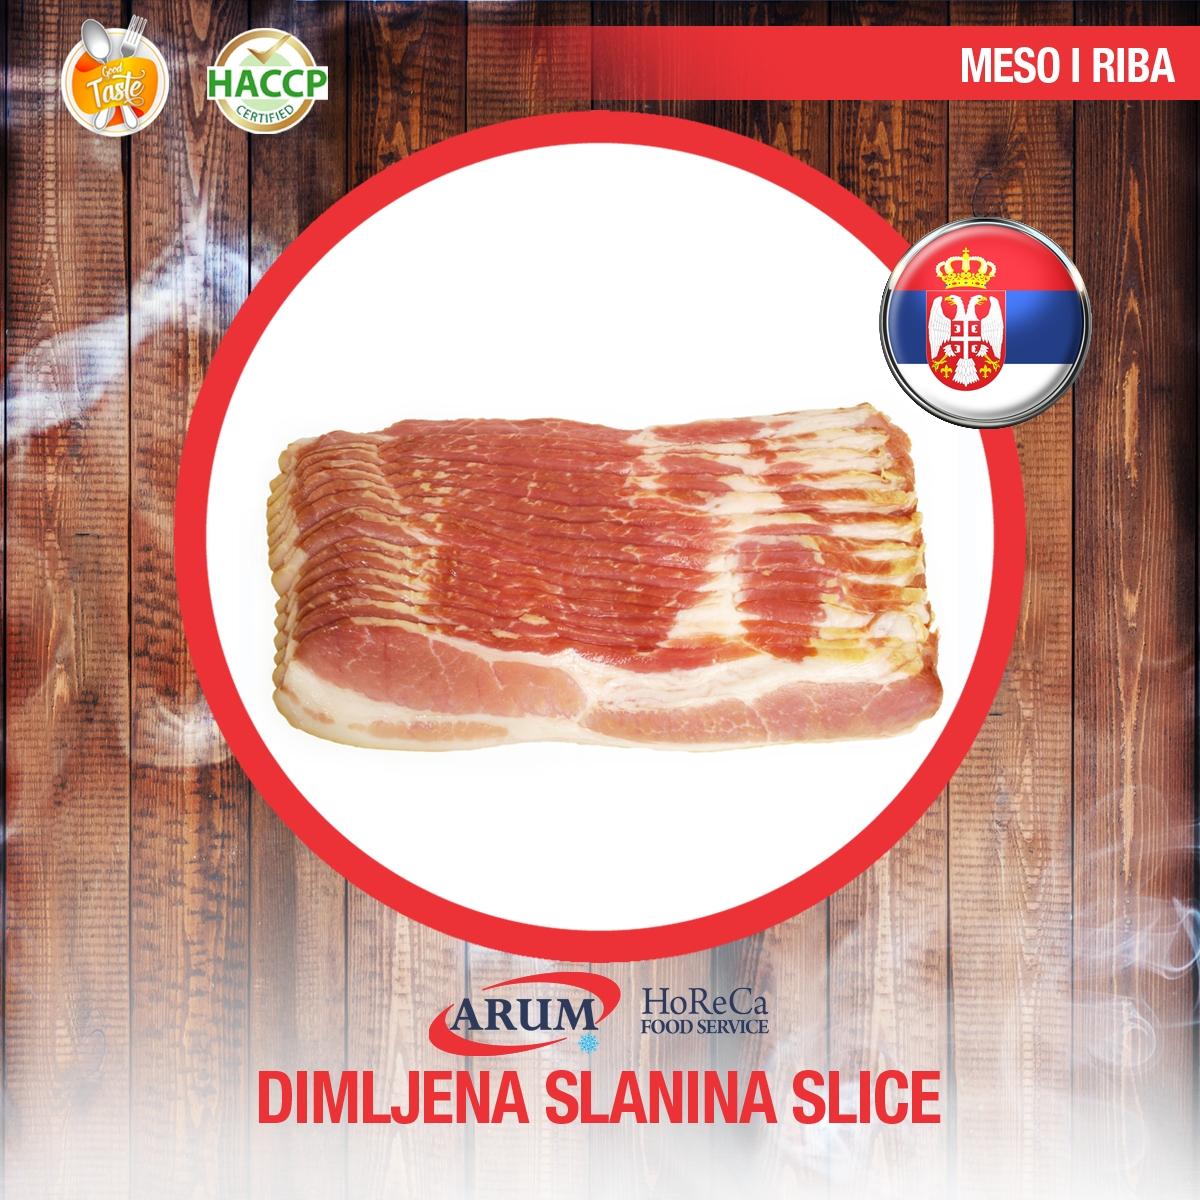 Dimljena slanina slice